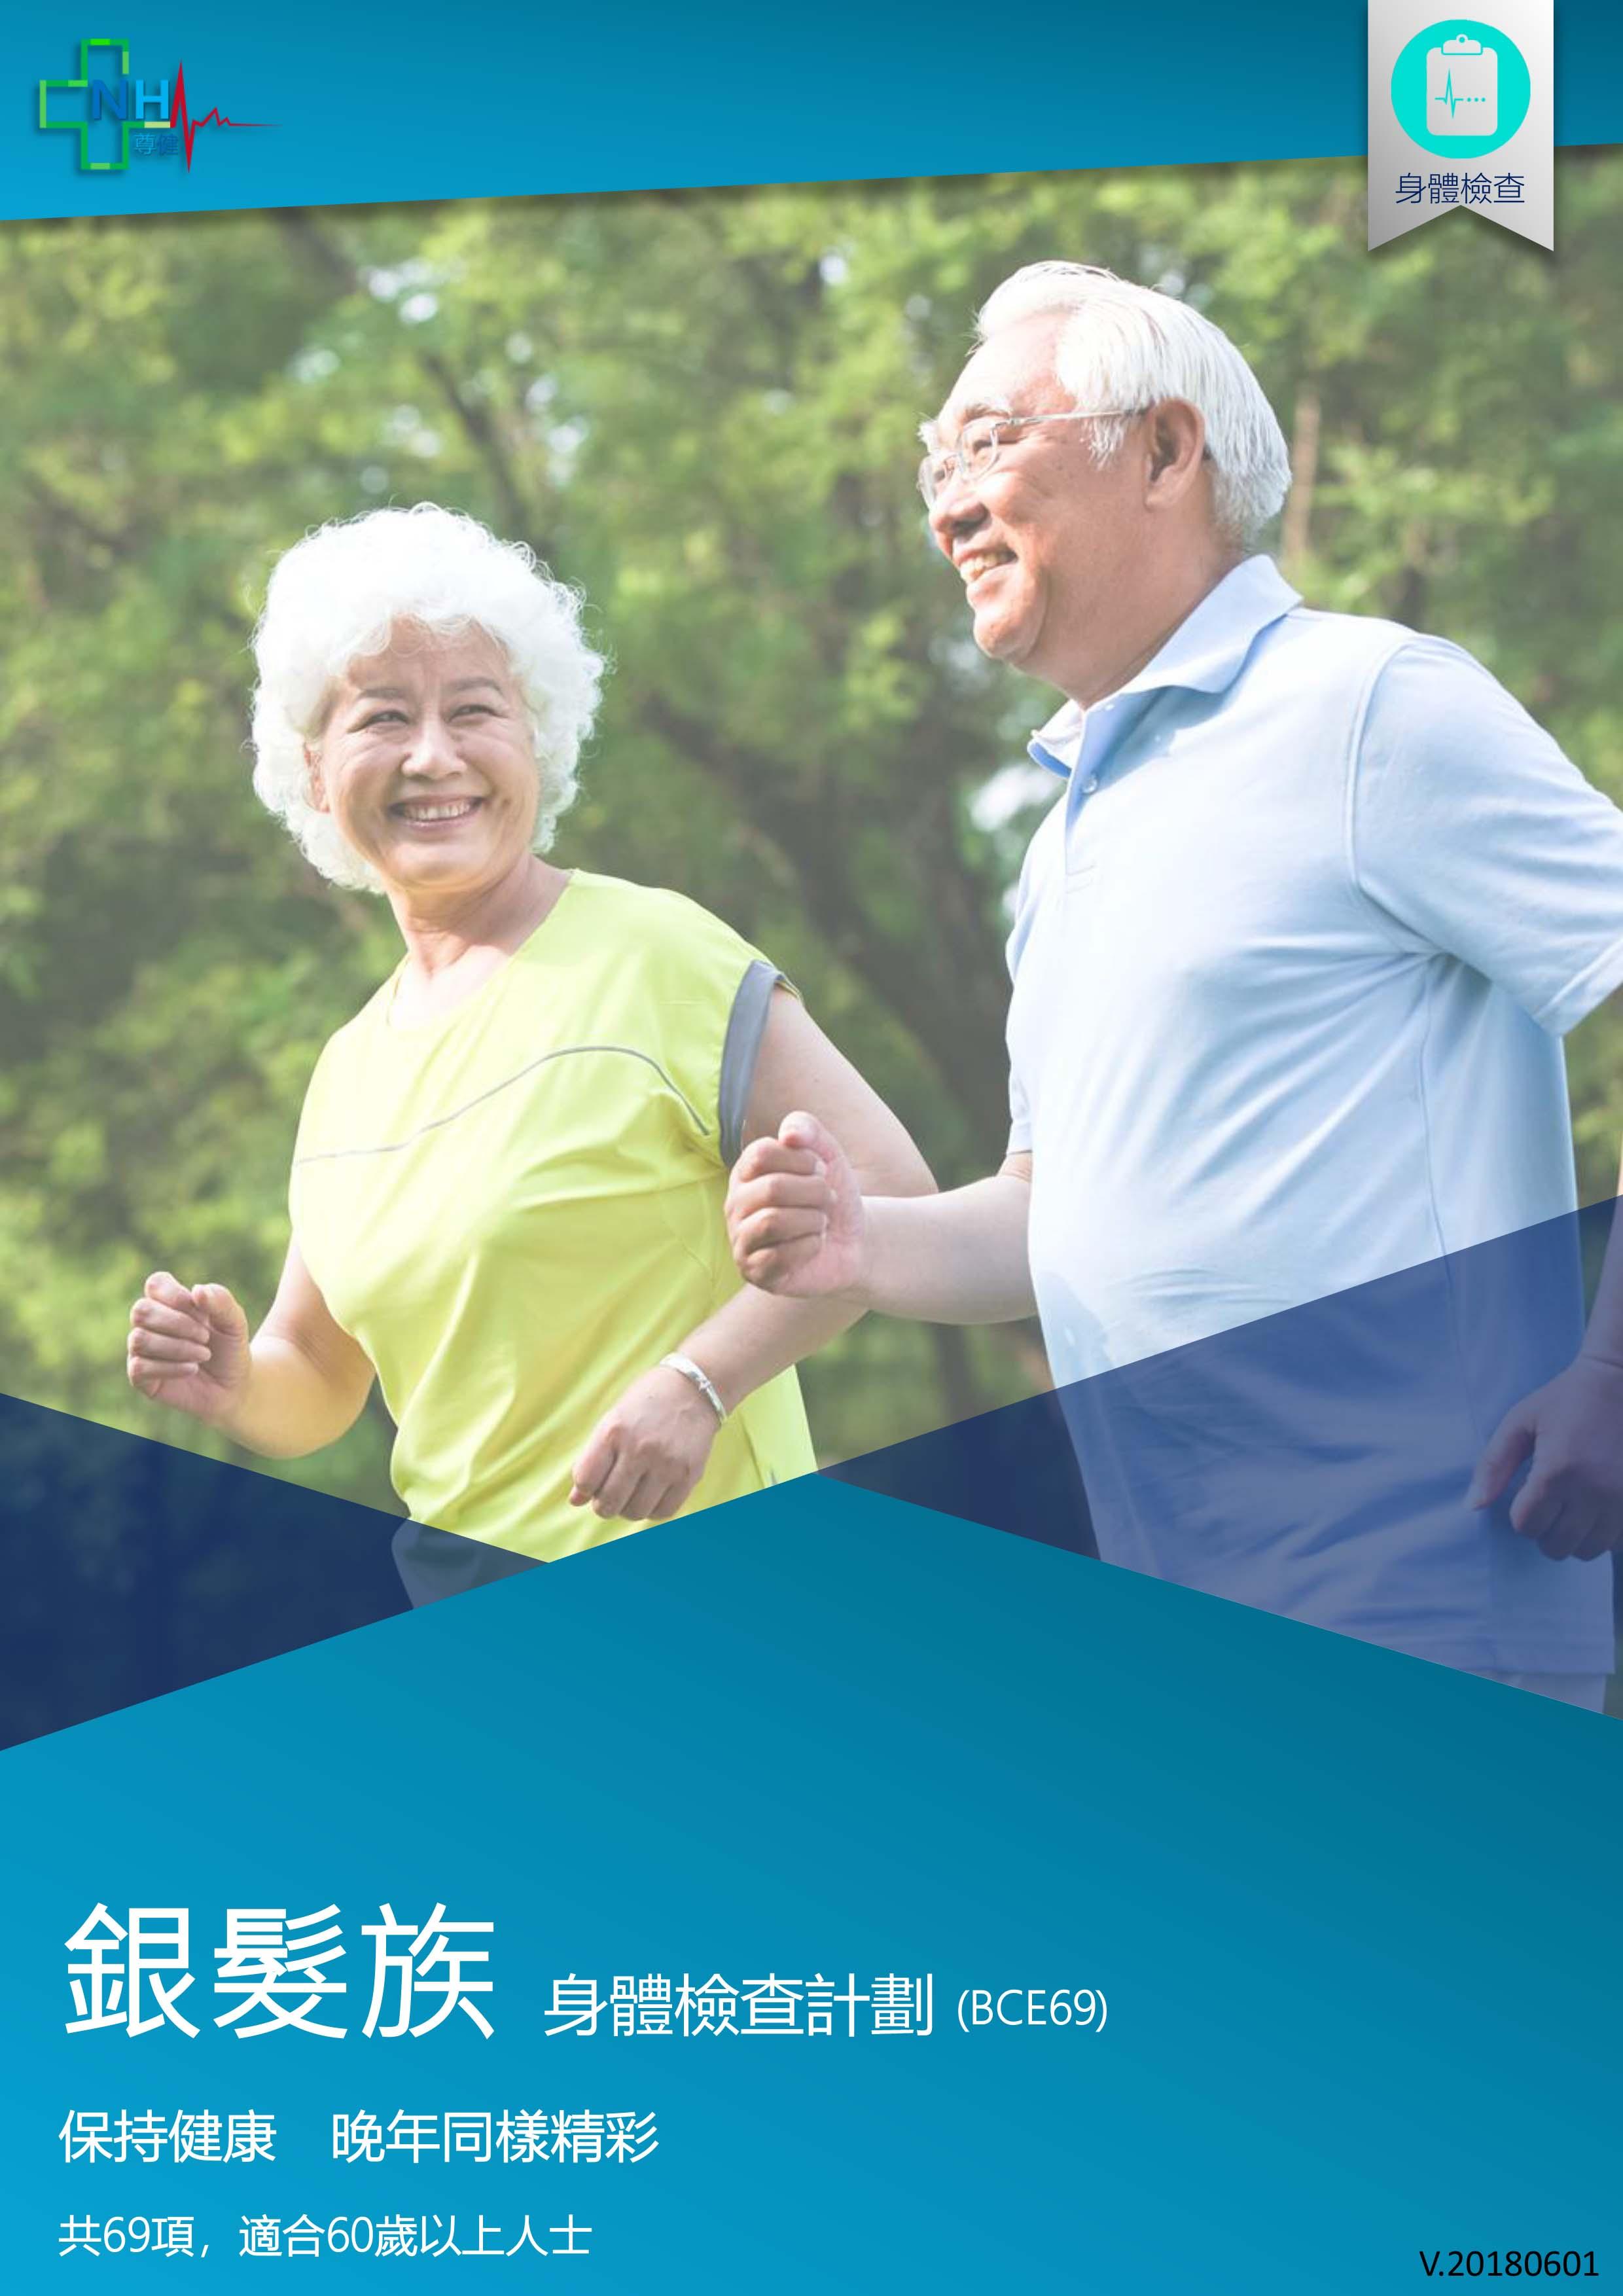 1j-elderly-body-check-1.jpg